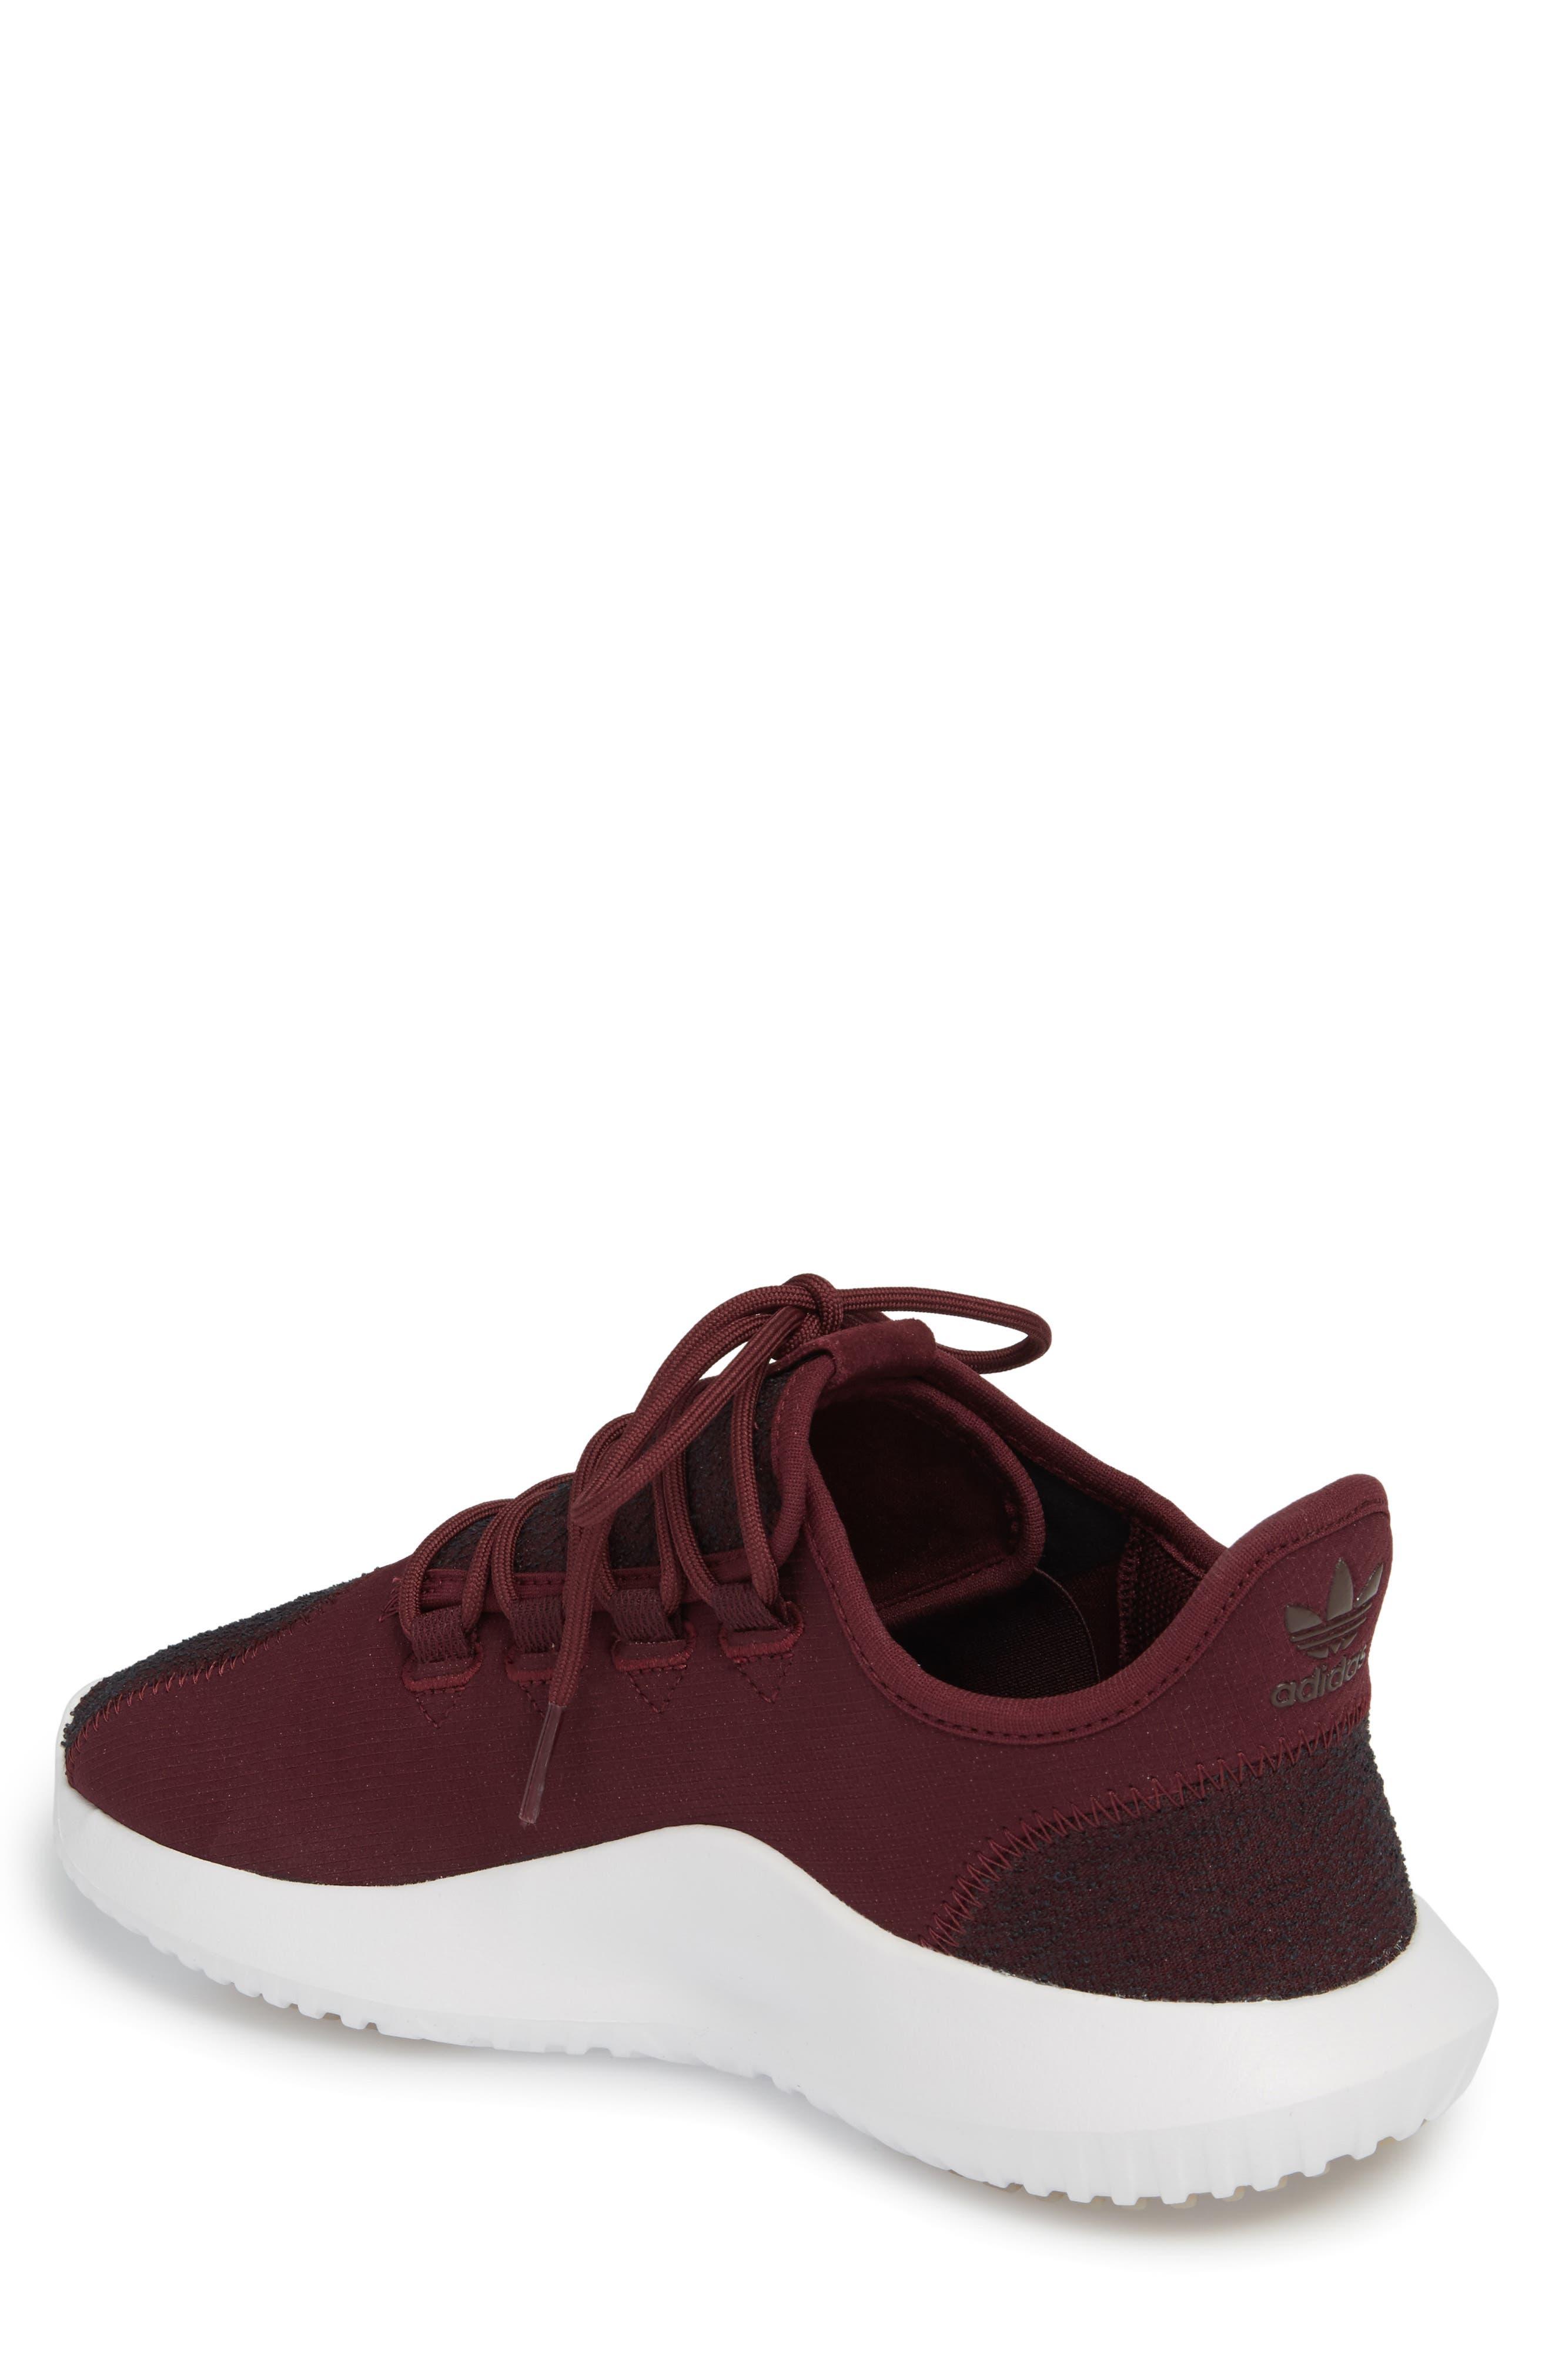 Tubular Shadow Sneaker,                             Alternate thumbnail 7, color,